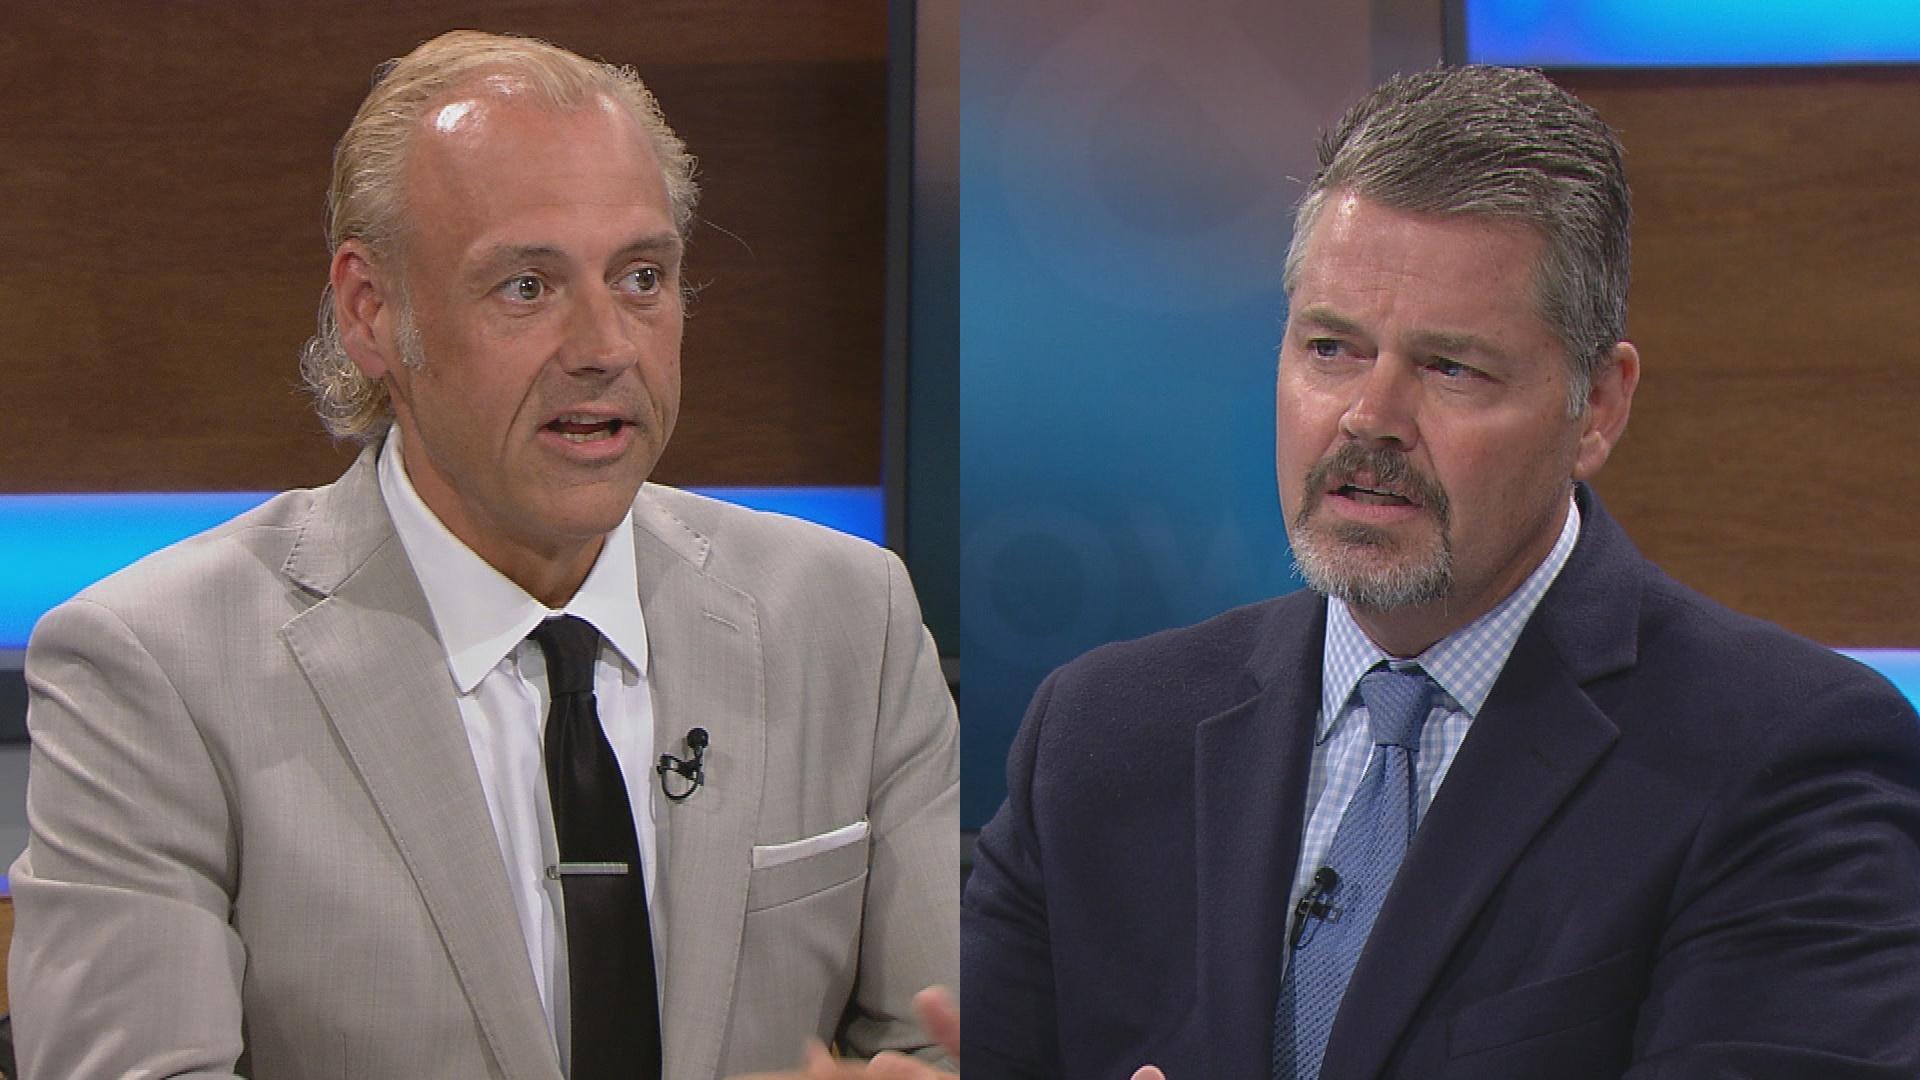 Political Panelists Touch on Washington politics